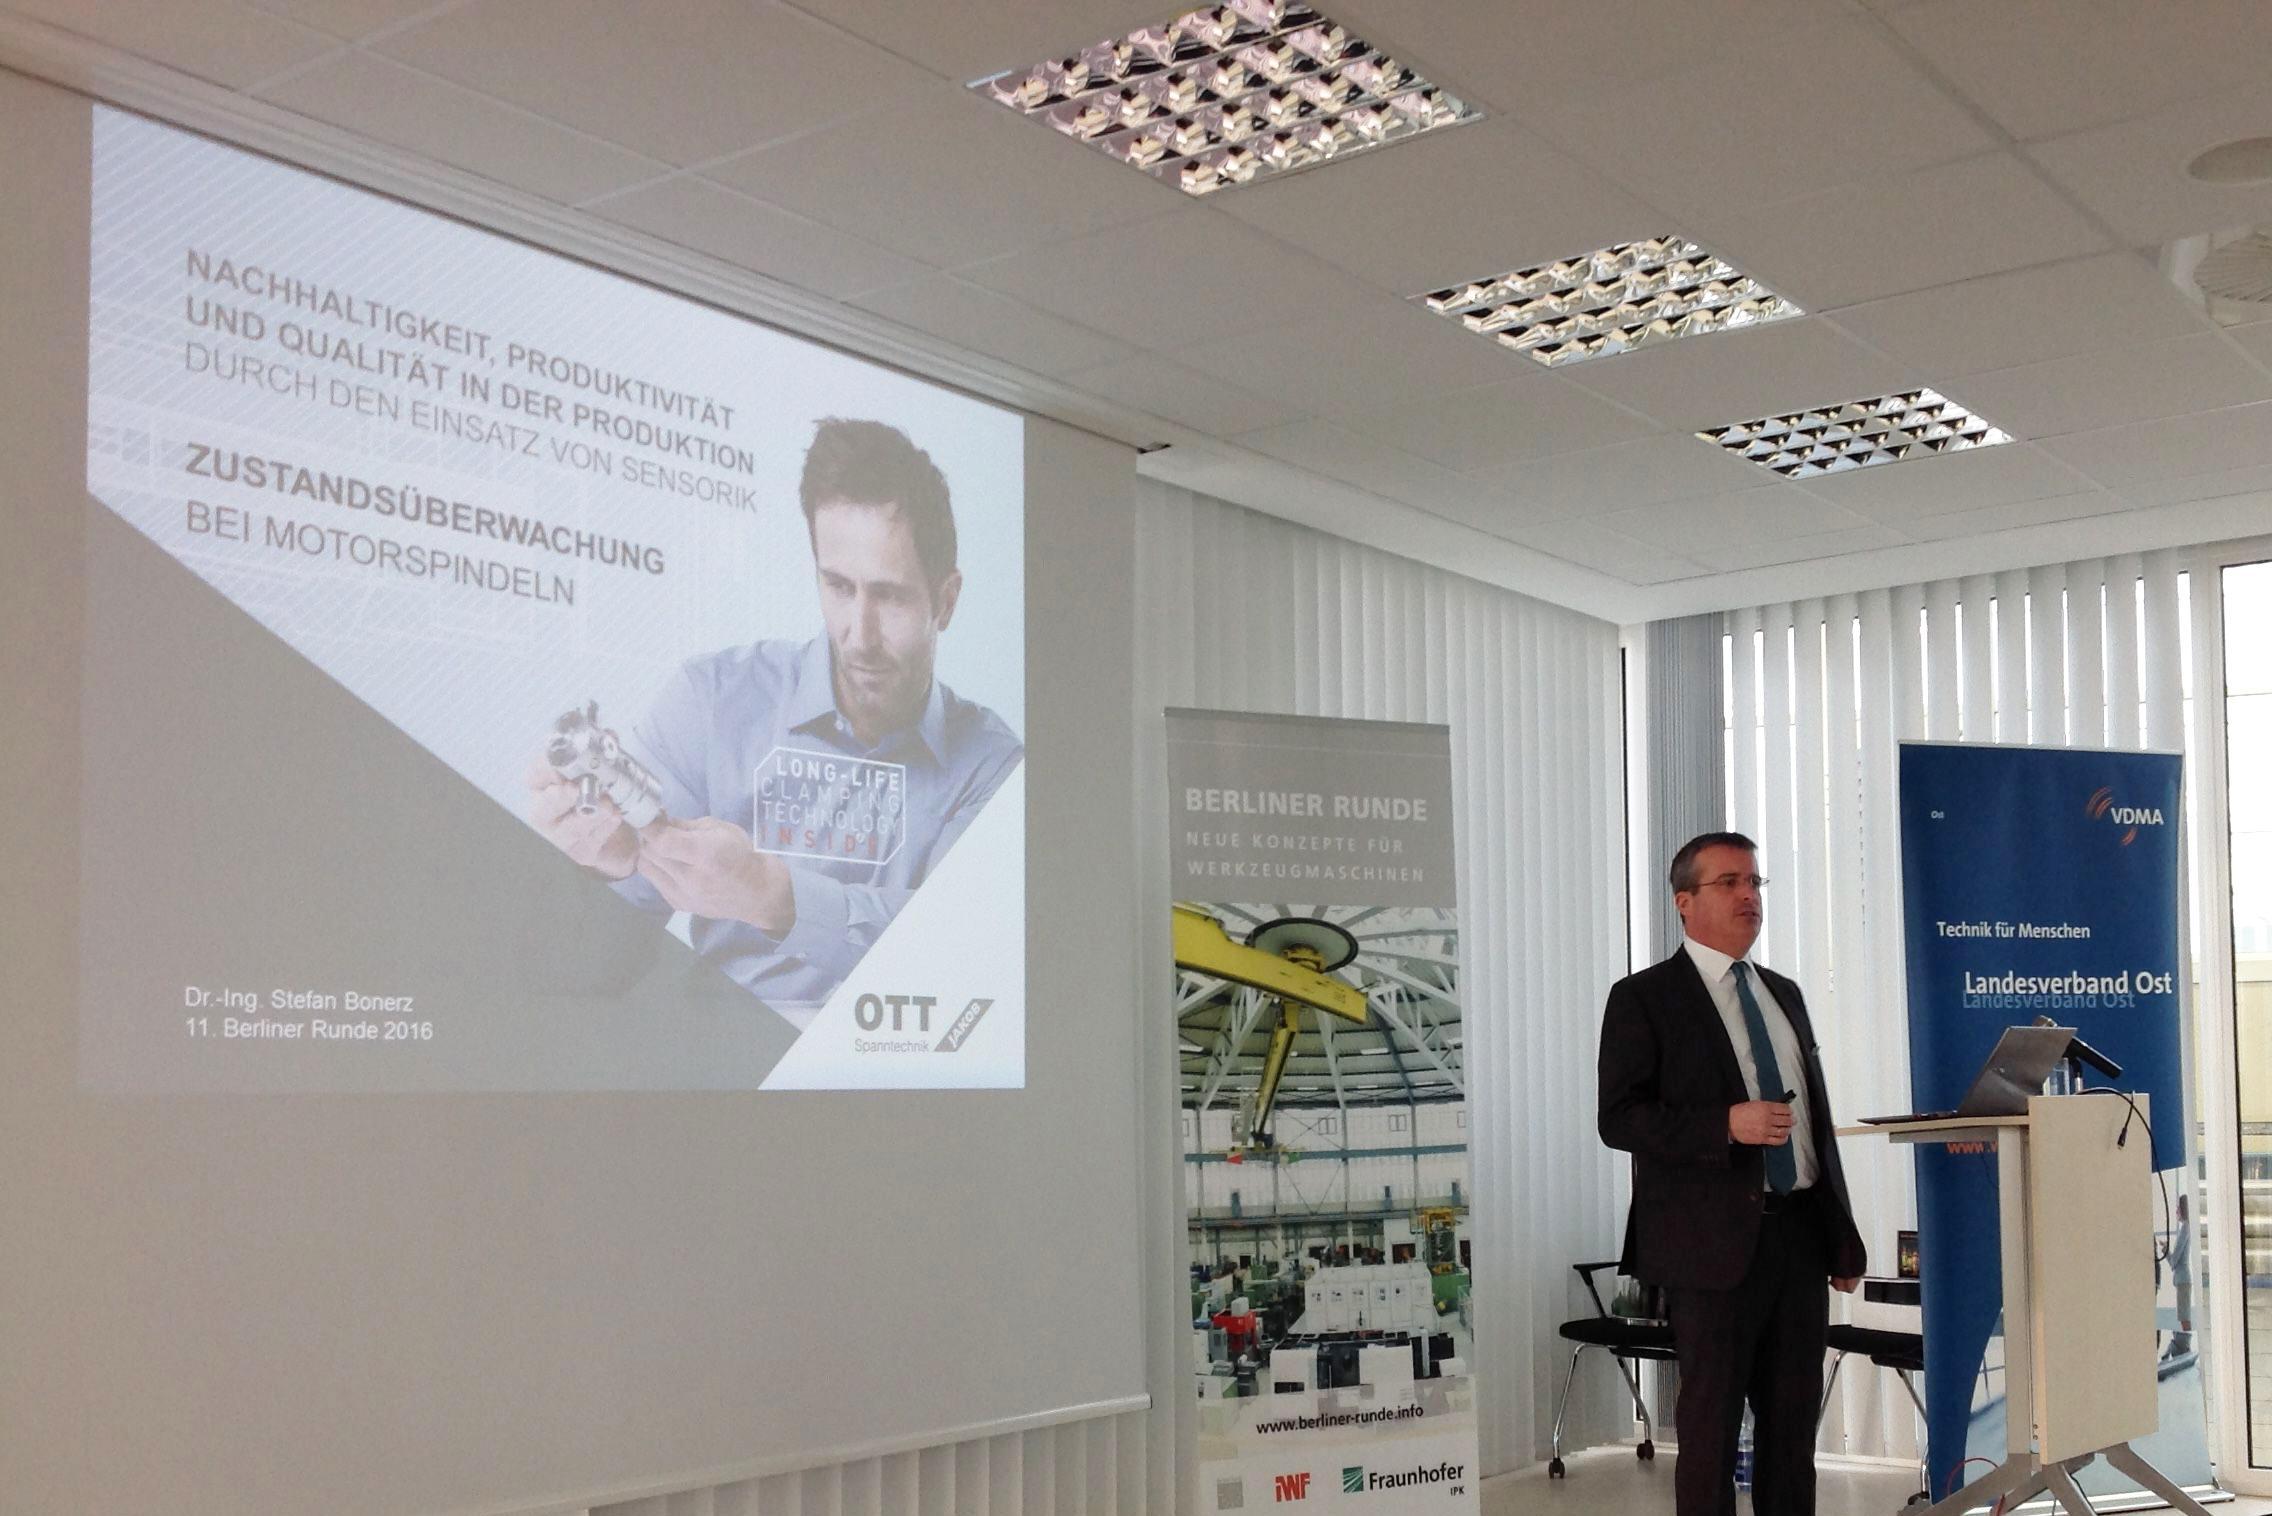 OTT-JAKOB - Unternehmen - Bild - OTT-JAKOB beteiligt sich an Berliner Runde 2016